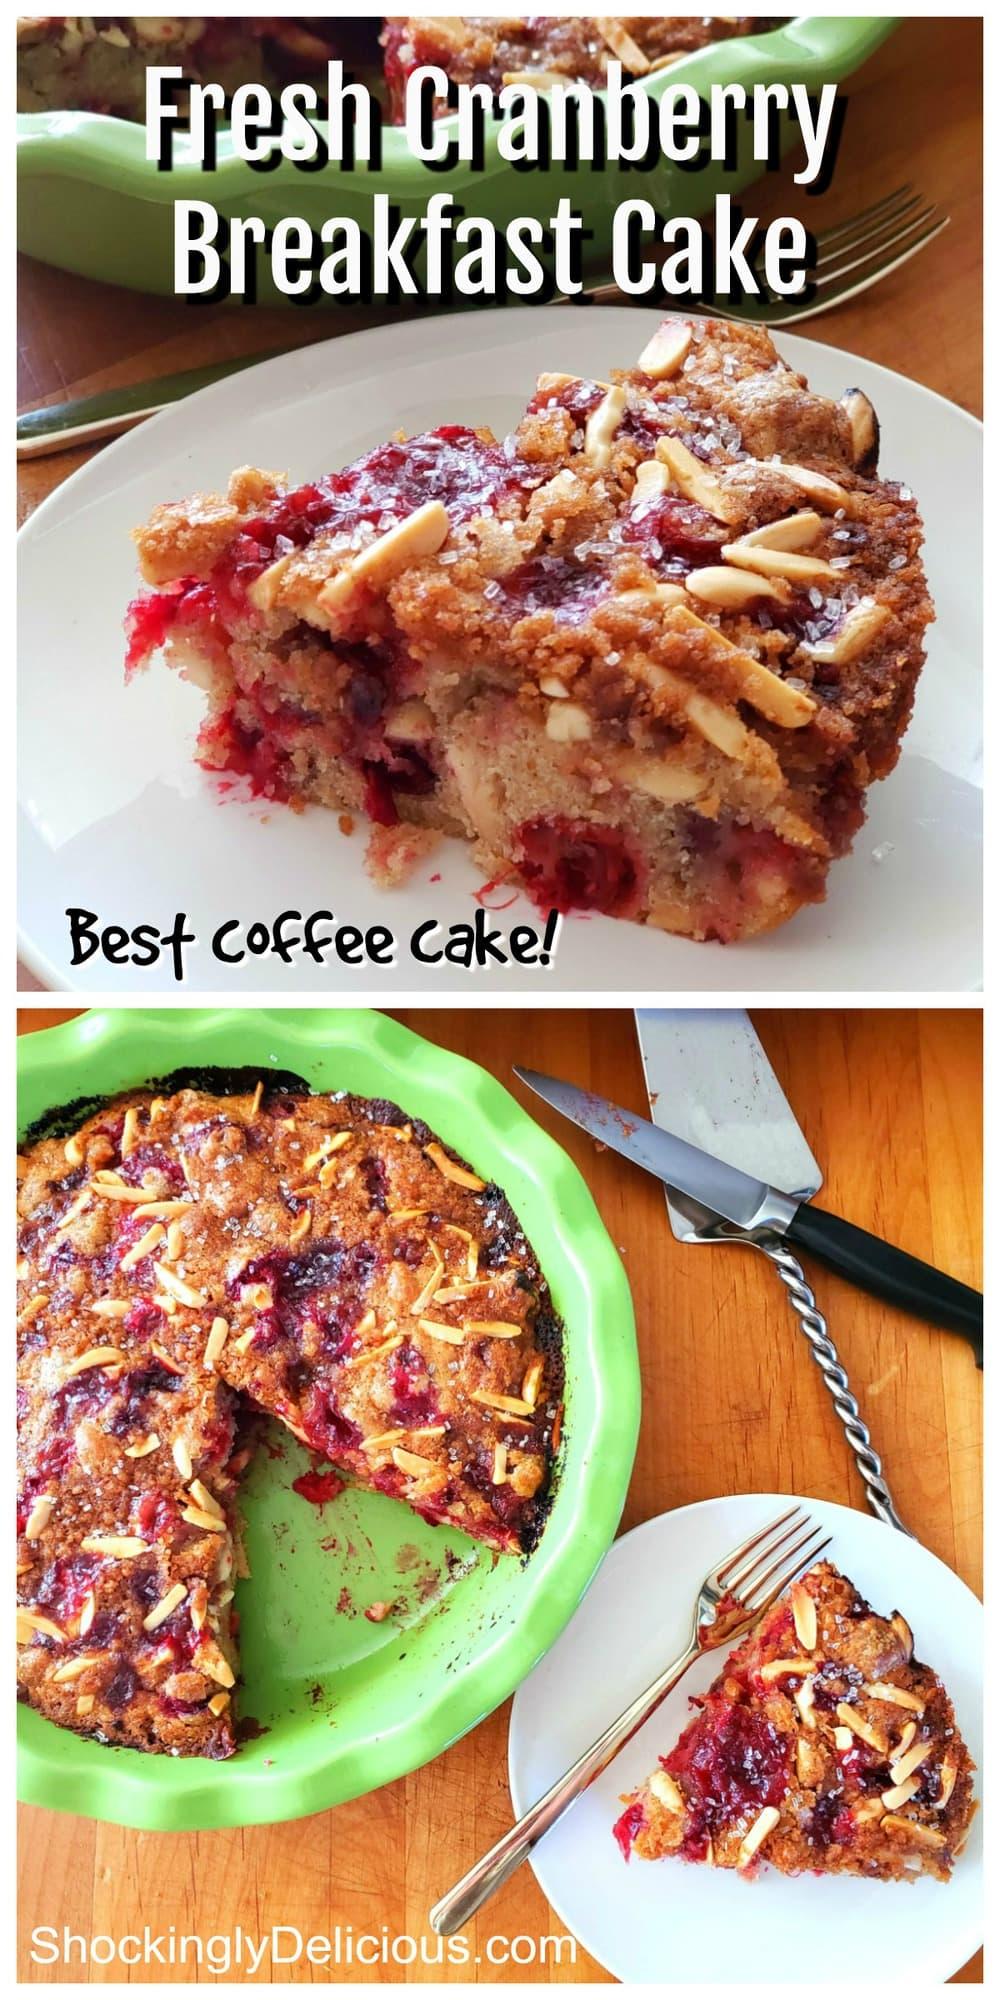 Fresh Cranberry Breakfast Cake recipe on ShockinglyDelicious.com